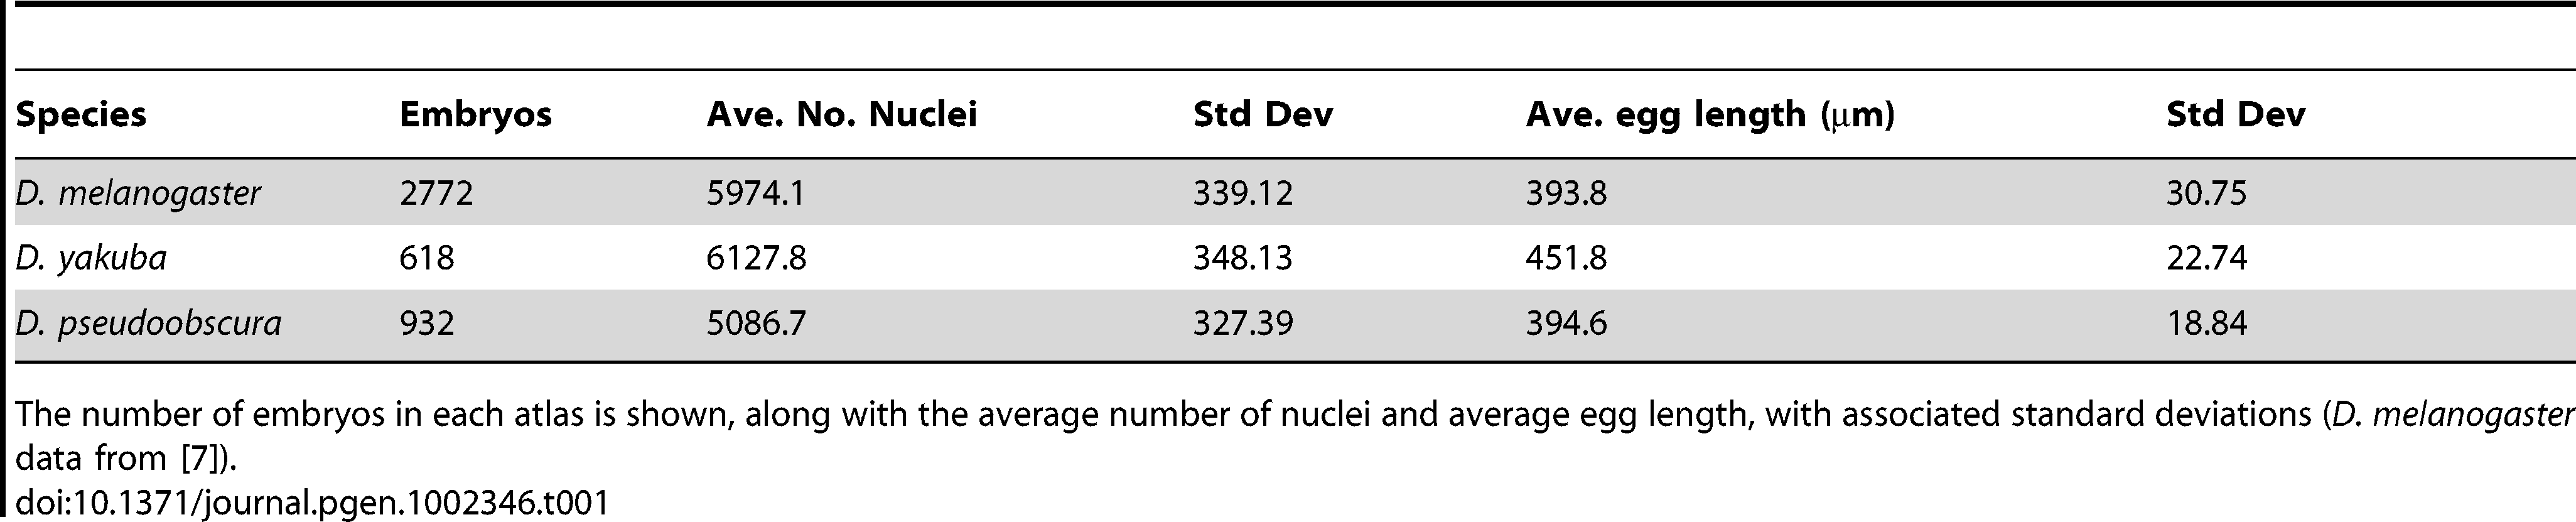 Egg length and nuclear number varies in blastoderm embryos of <i>D. melanogaster</i>, <i>D. yakuba</i>, and <i>D. pseudoobscura</i>.